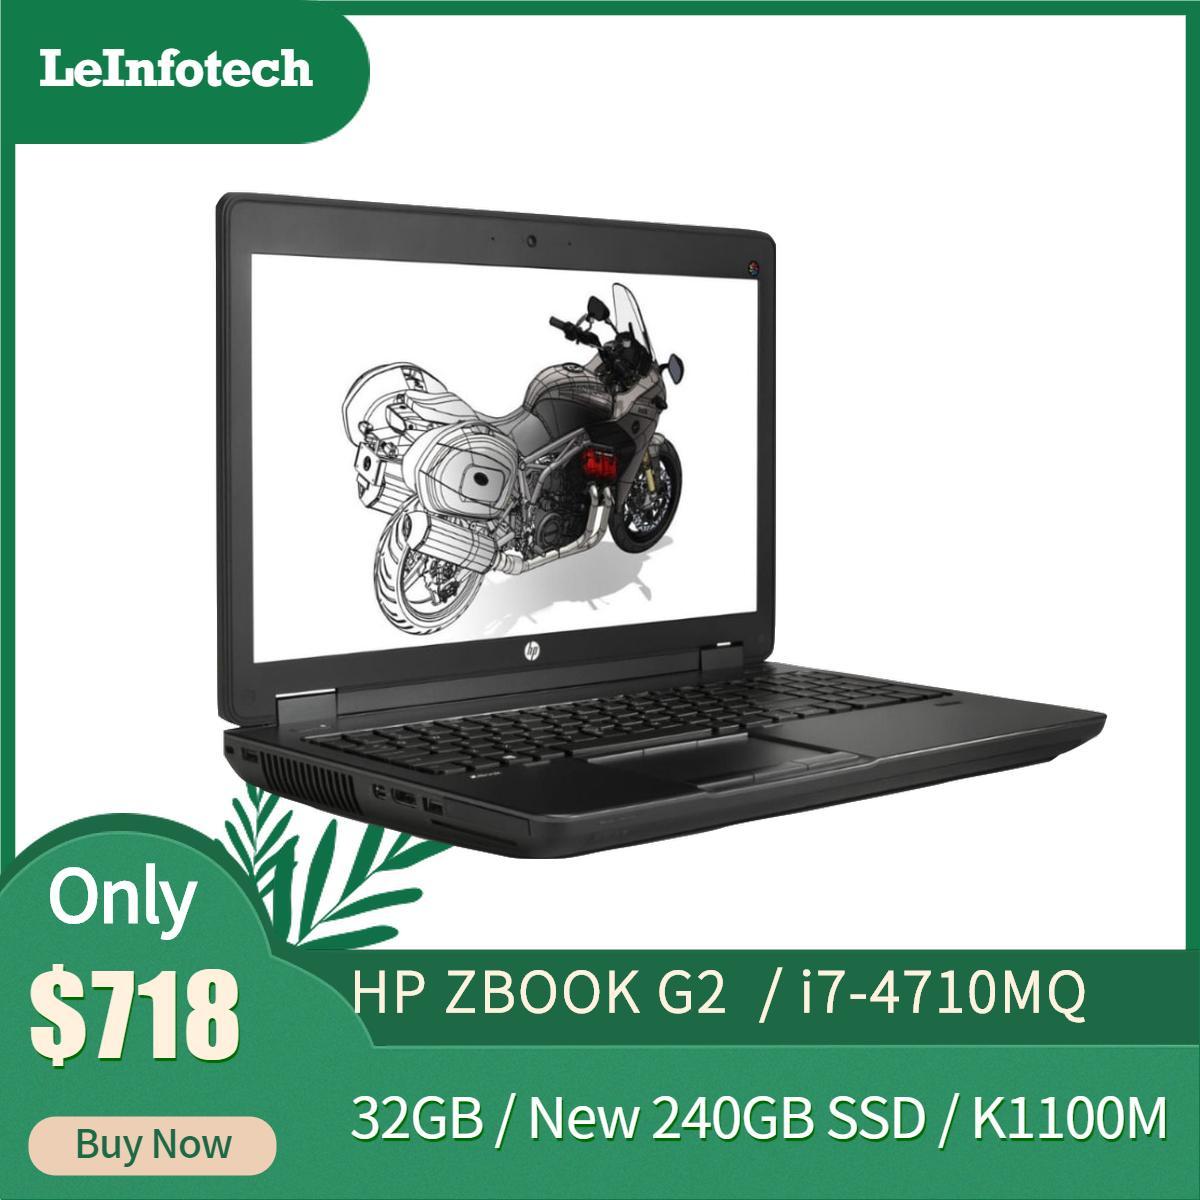 Hp Zbook 15 G2 Mobile Workstation /i7-4710MQ #2.6Ghz /32gb Ram/ New 240GB SSD/ Nvidia K1100M 1gb/ Win 10 Pro / 15inch LED / Refurbished